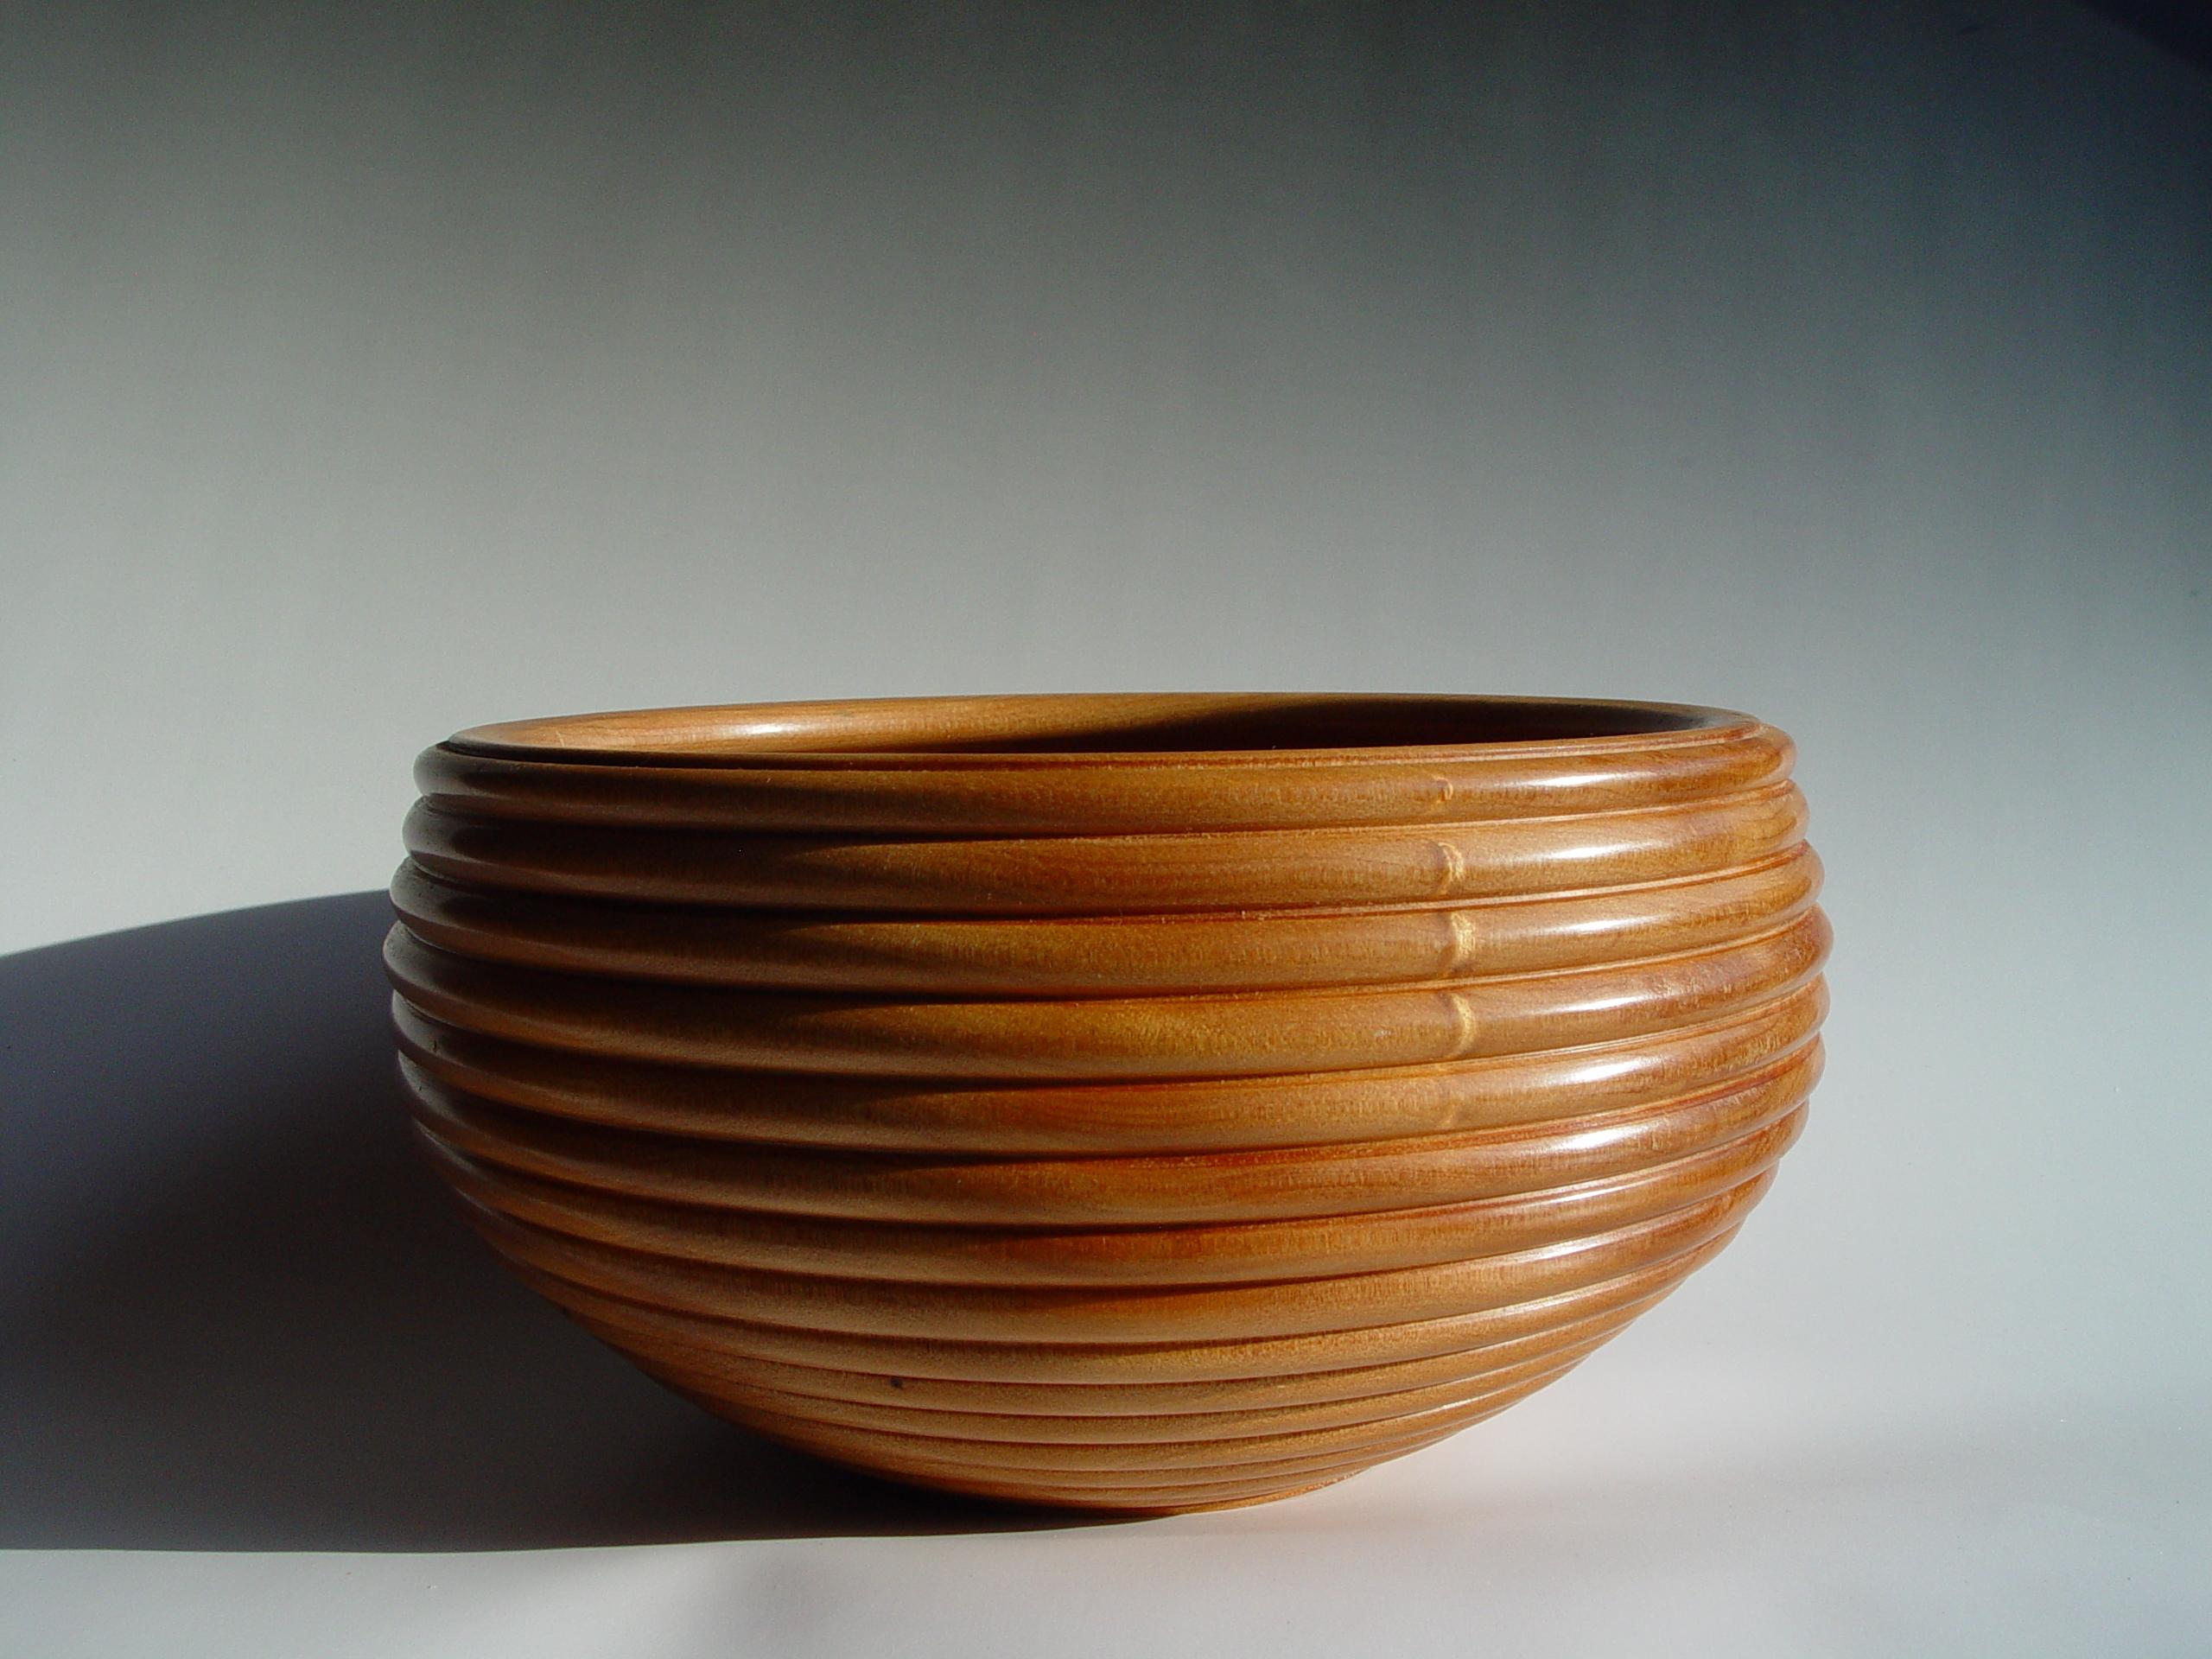 Beads on bowl